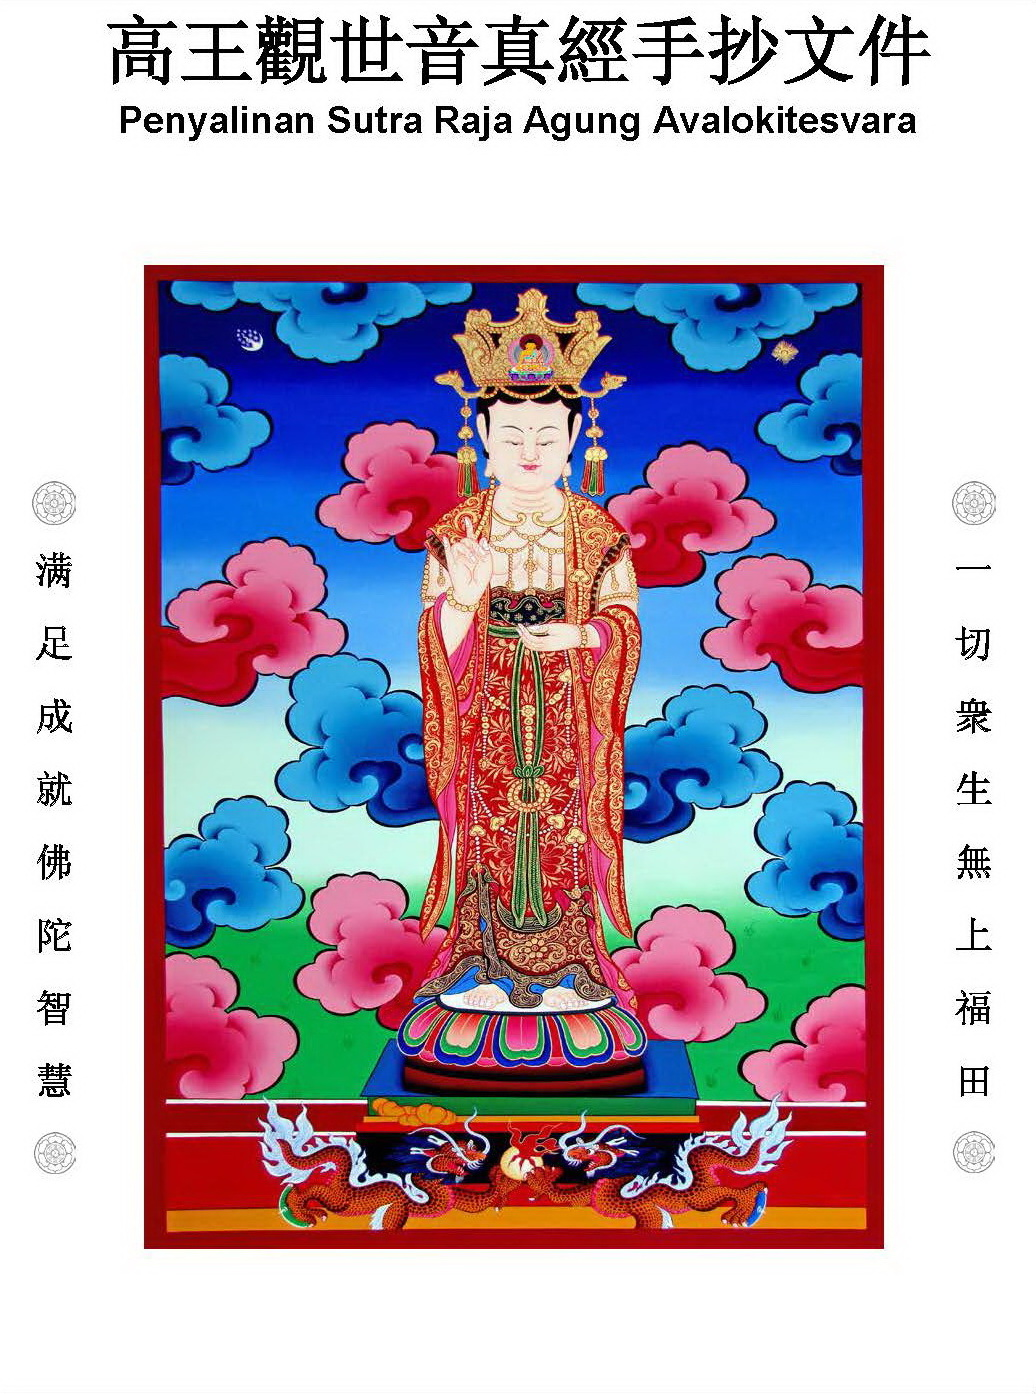 Penyalinan Sutra Raja Agung Avalokitesvara Versi Kedua